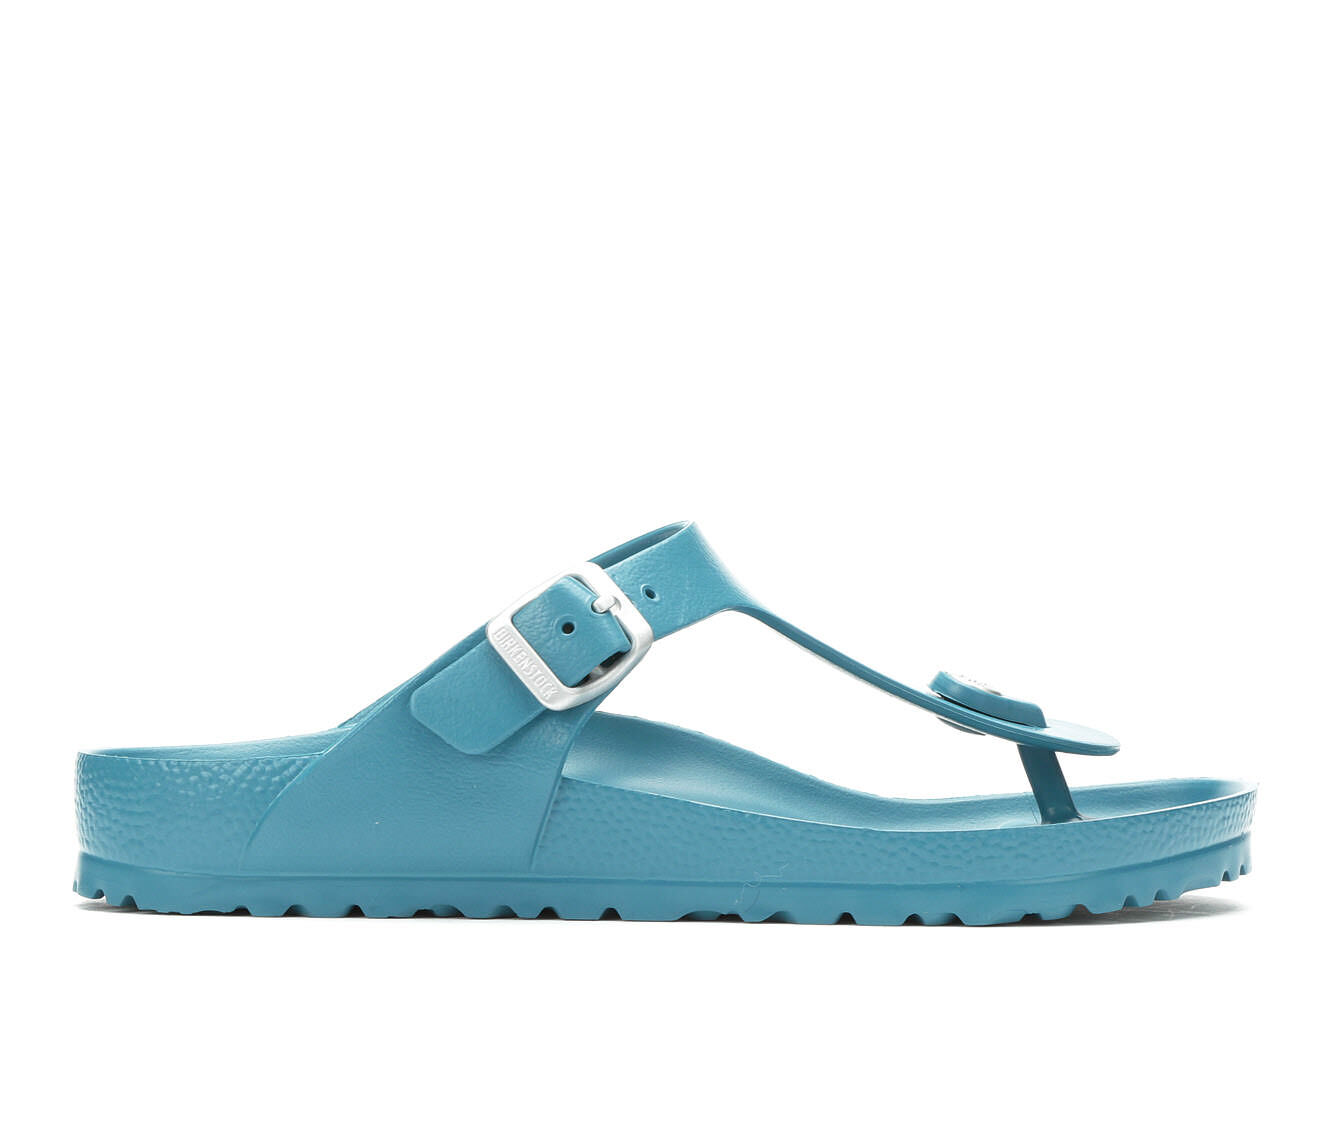 Women's Birkenstock Gizeh Essentials Footbed Sandals Turquoise